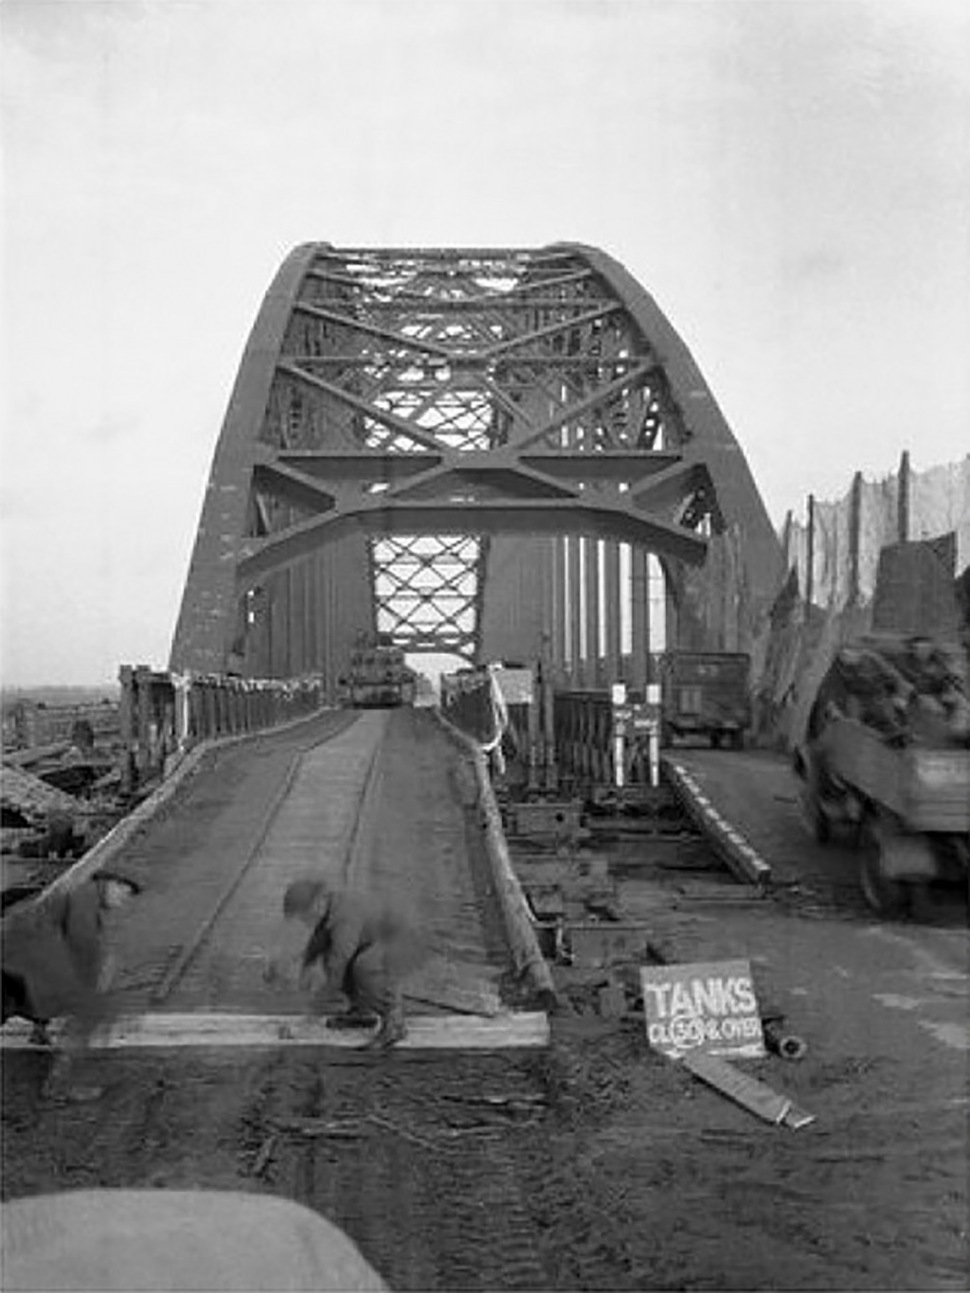 190319-road-bridge-nijmegen-stabilized-with-bailey-bridges-1944